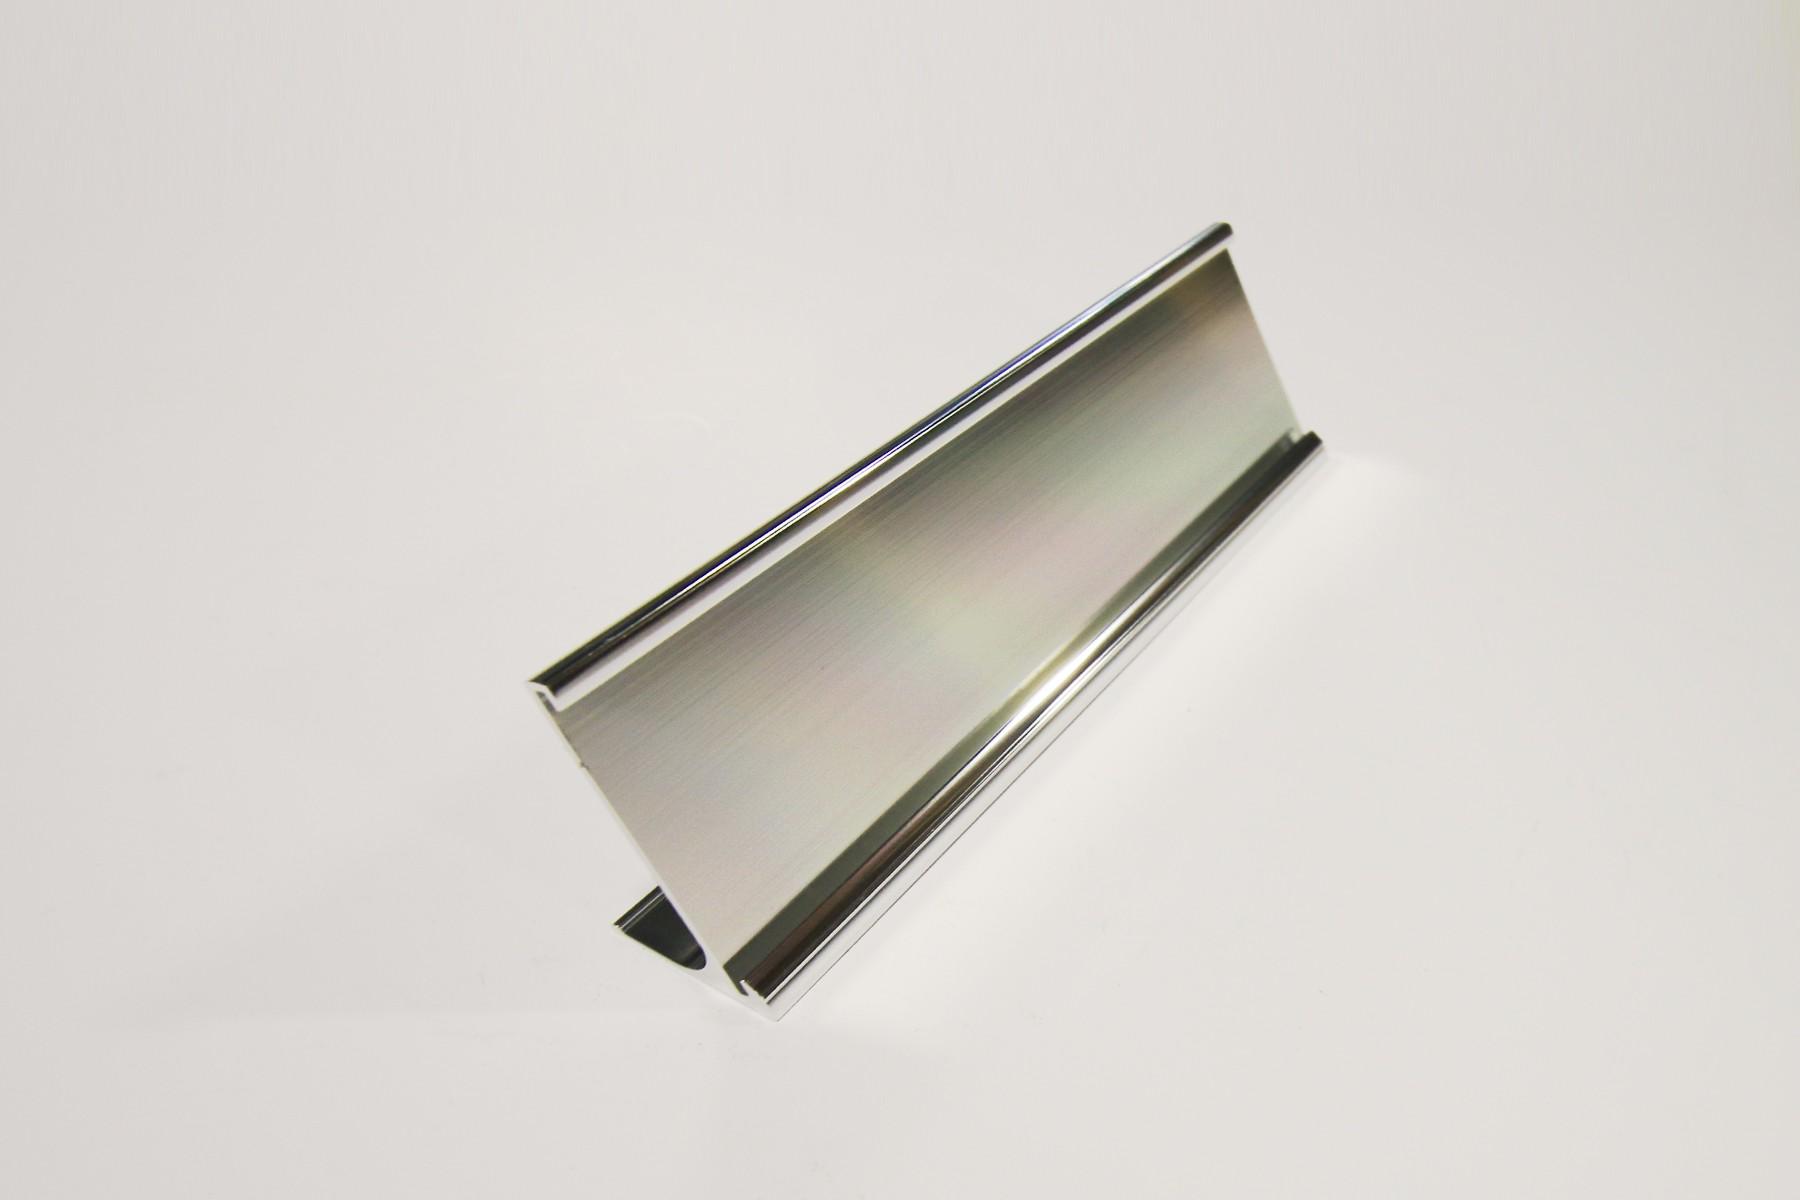 2 x 12 Desk Holder, Silver